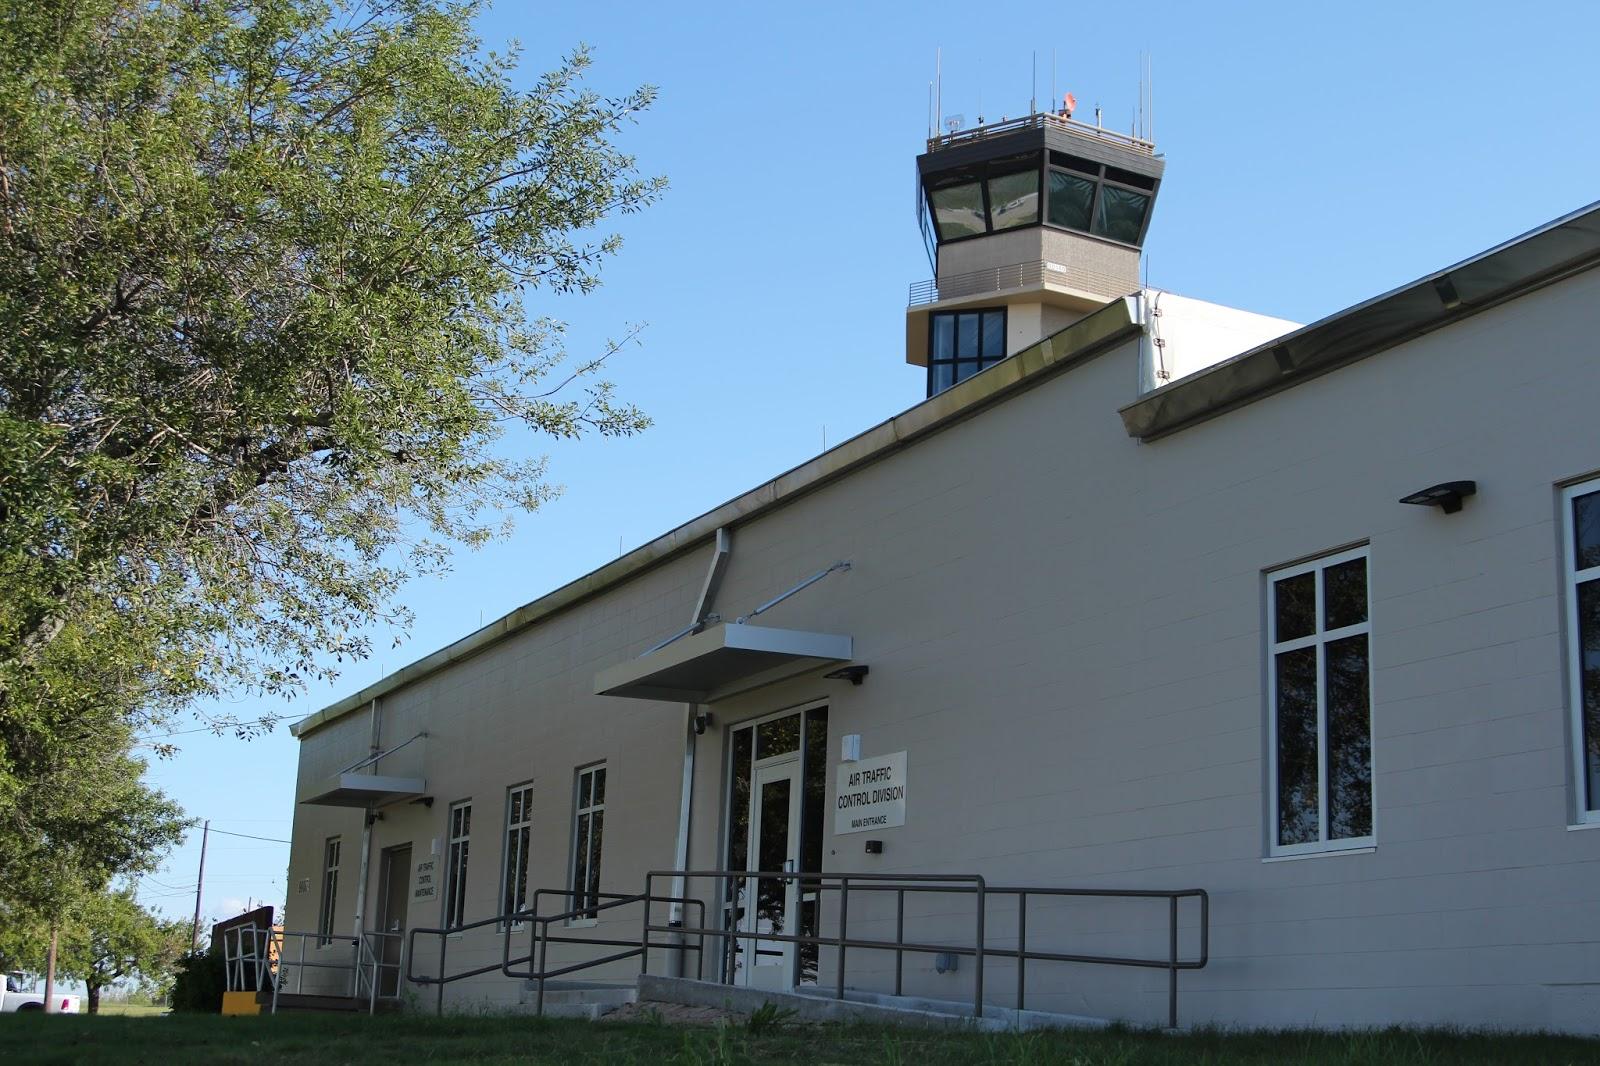 Radar approach facility renovation awarded Gold Medal